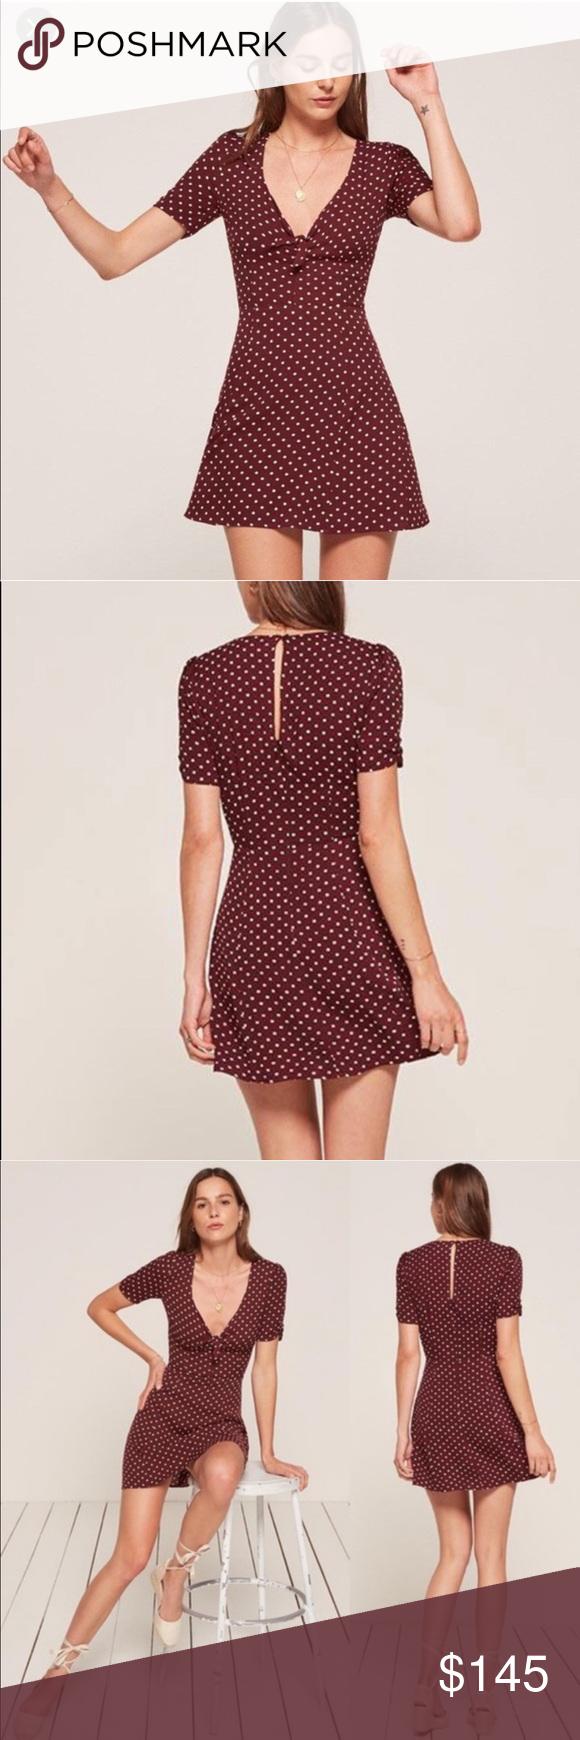 26+ Burgundy polka dot dress ideas in 2021